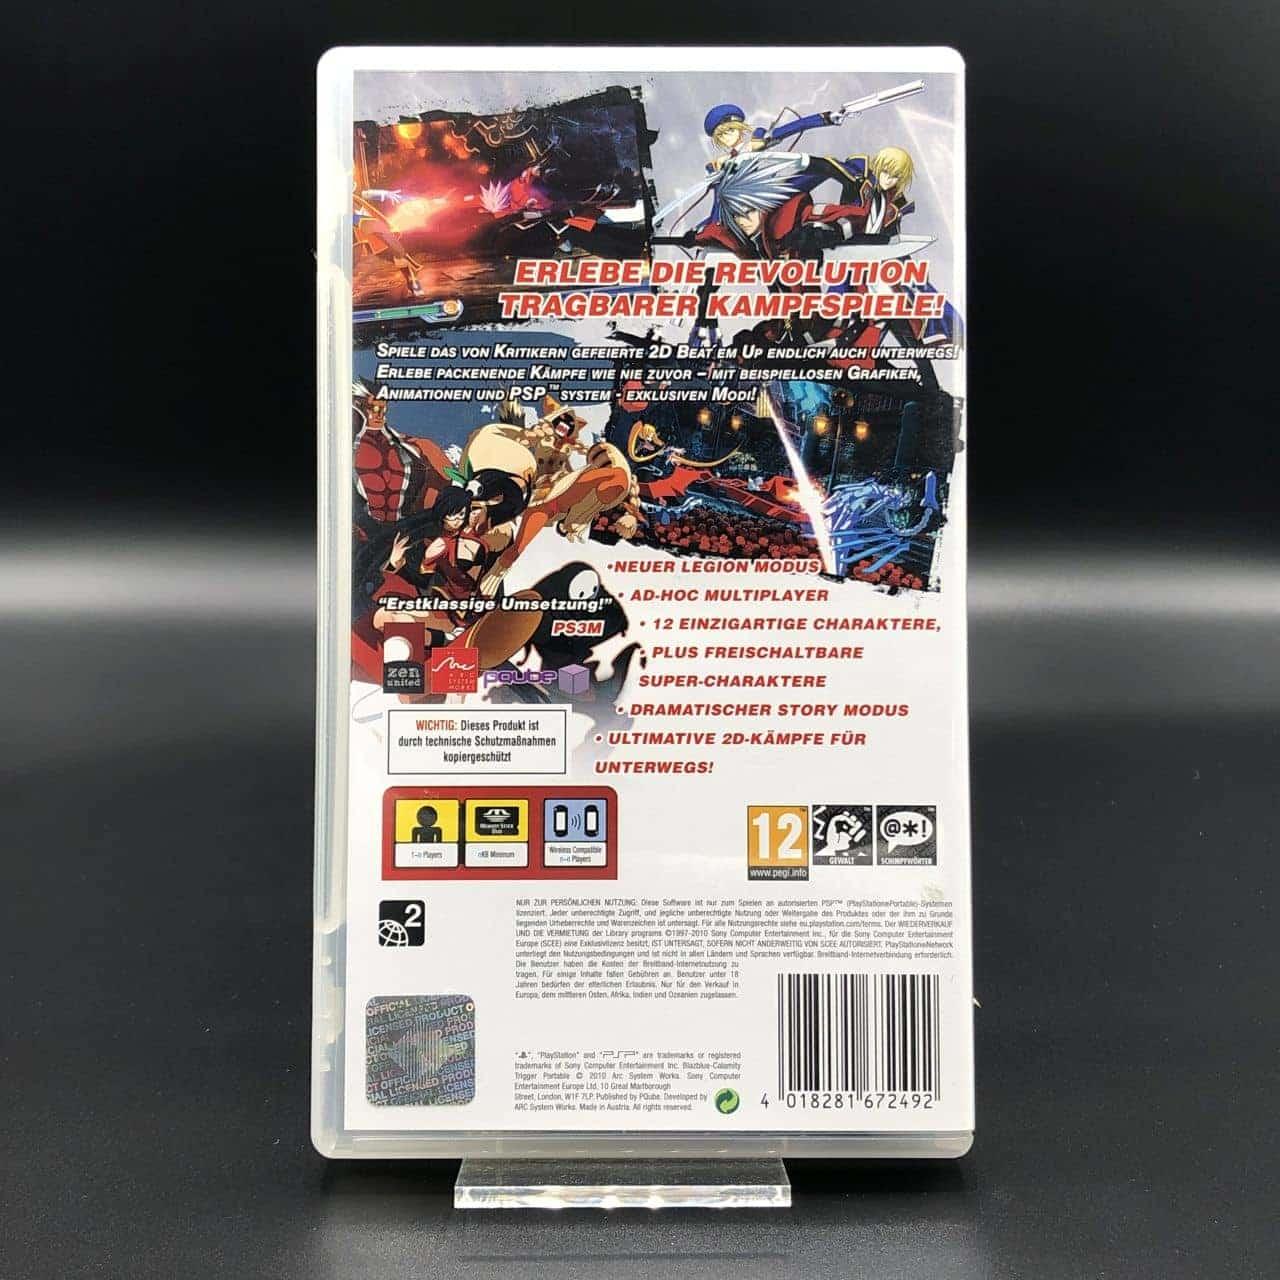 PSP BlazBlue: Calamity Trigger Portable (Komplett) (Sehr gut) Sony PlayStation Portable